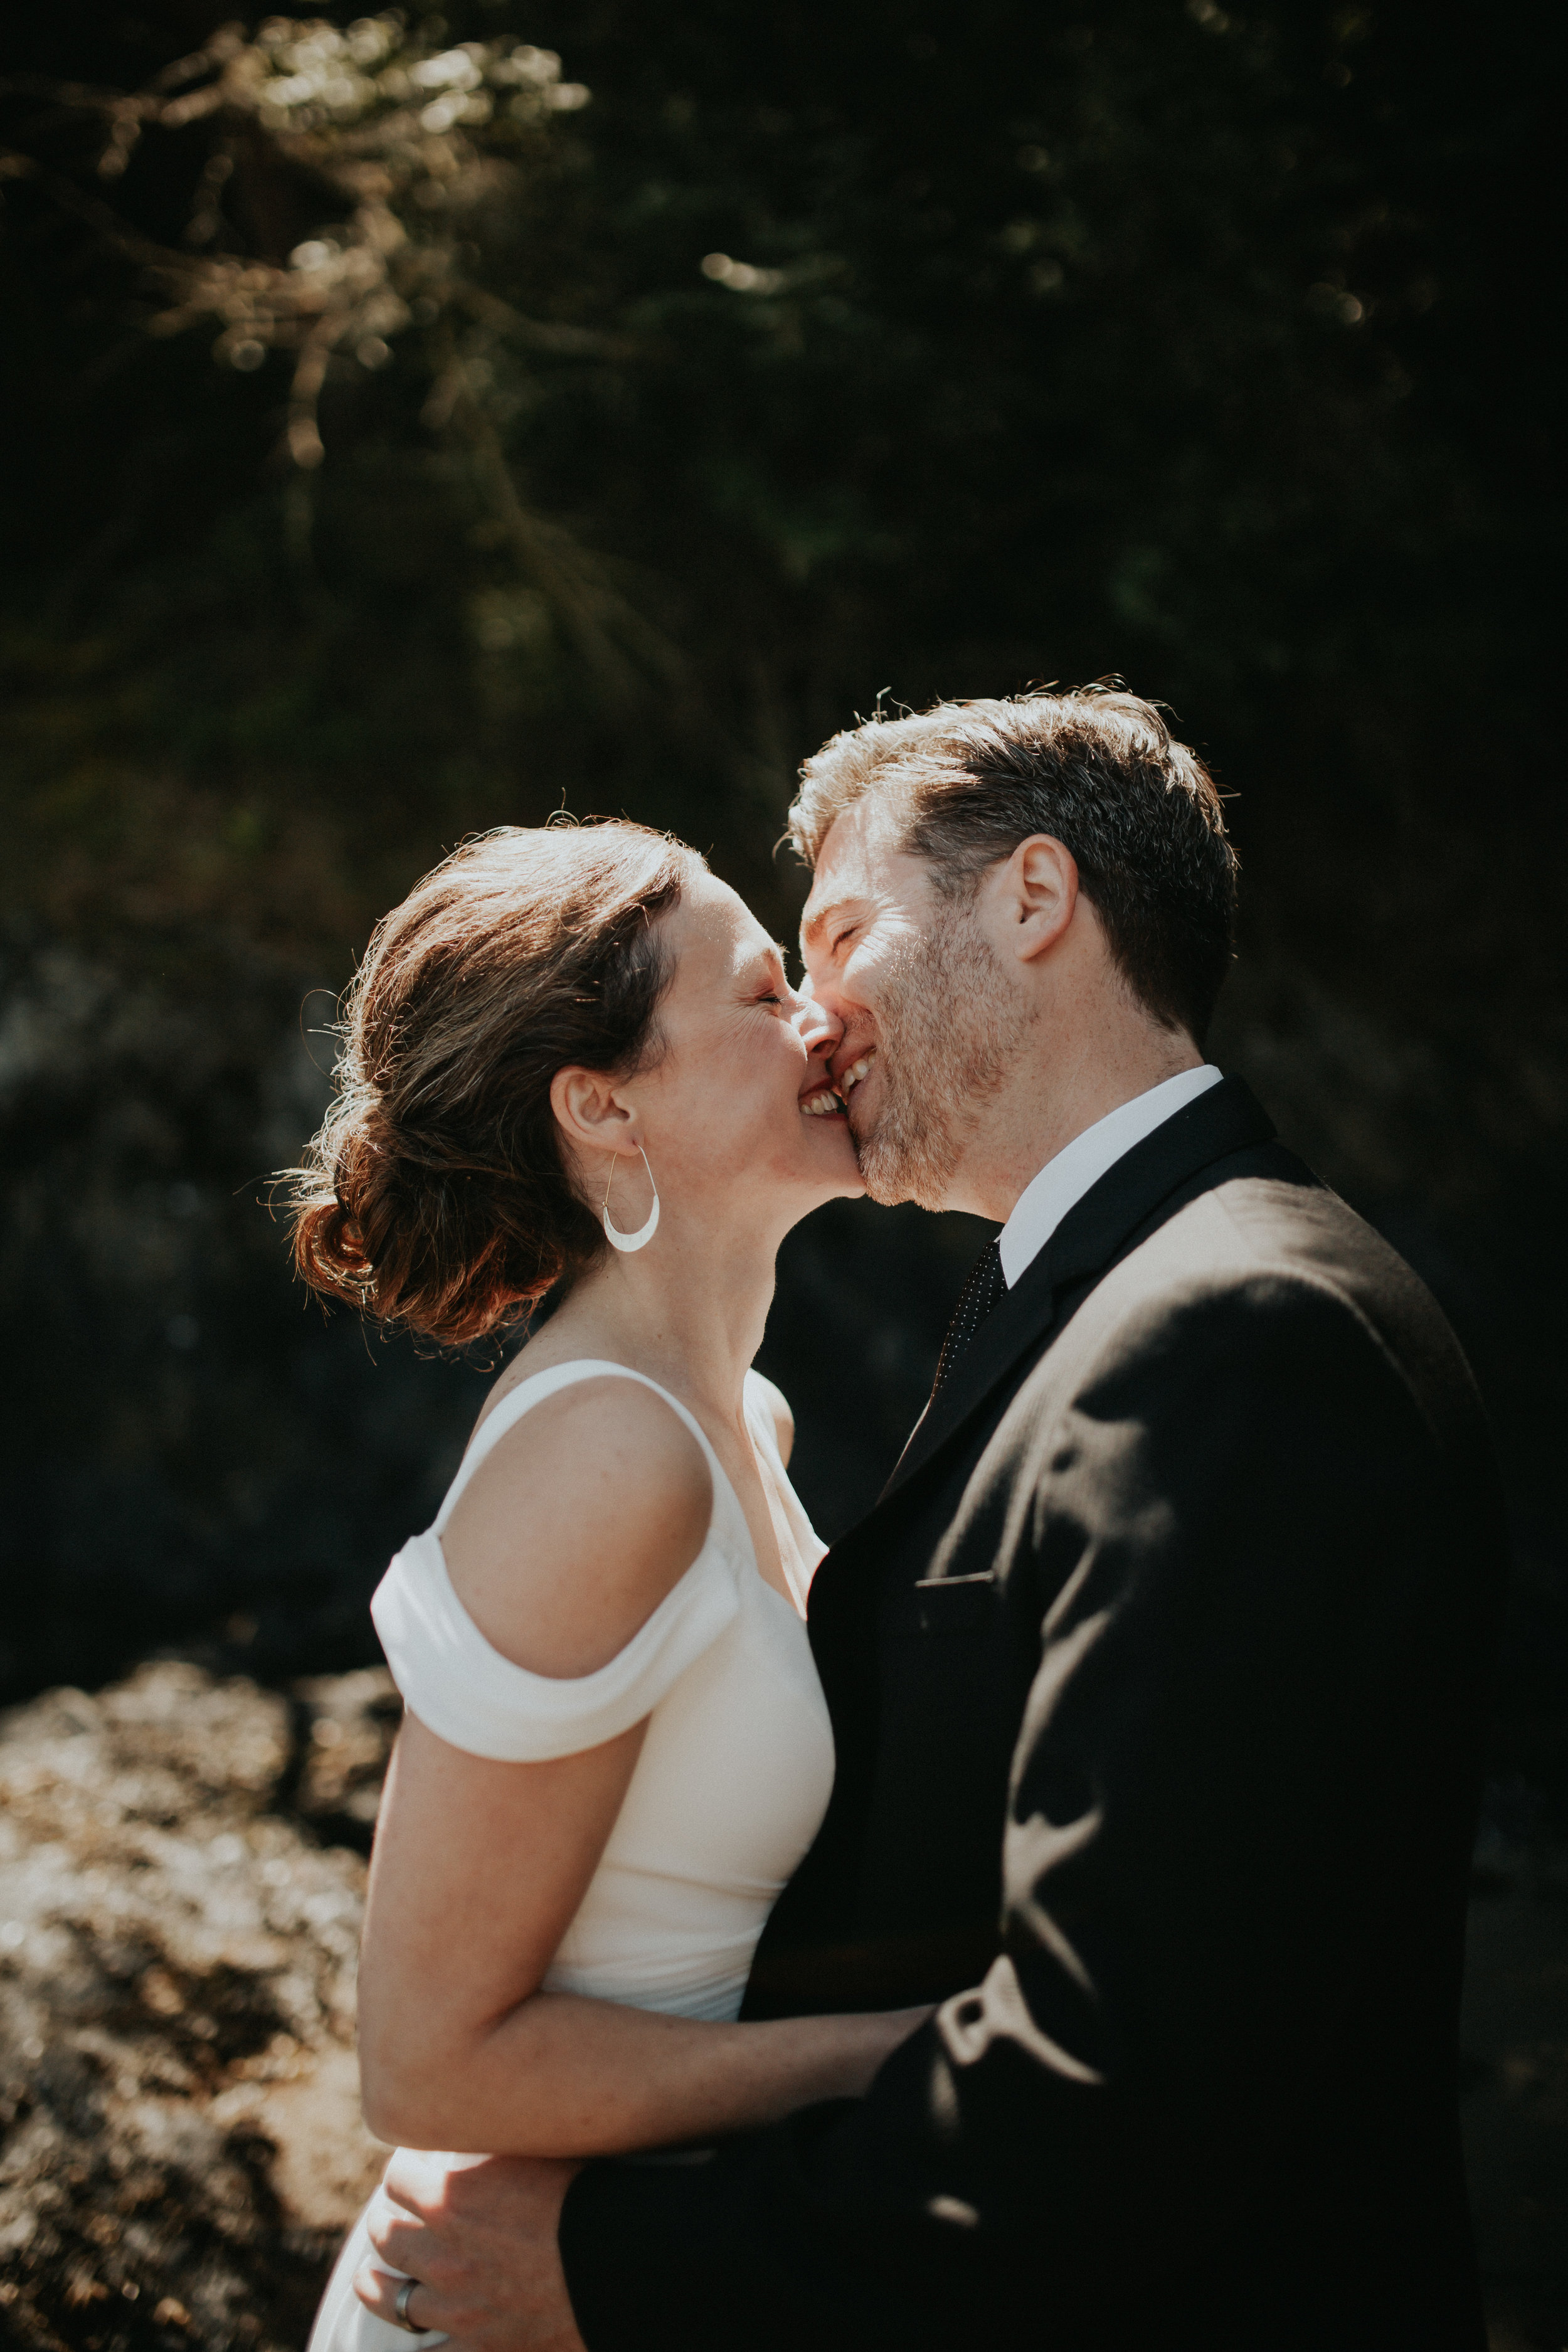 edmonds washington   backyard wedding inspiration   deception point pass state park wedding photos